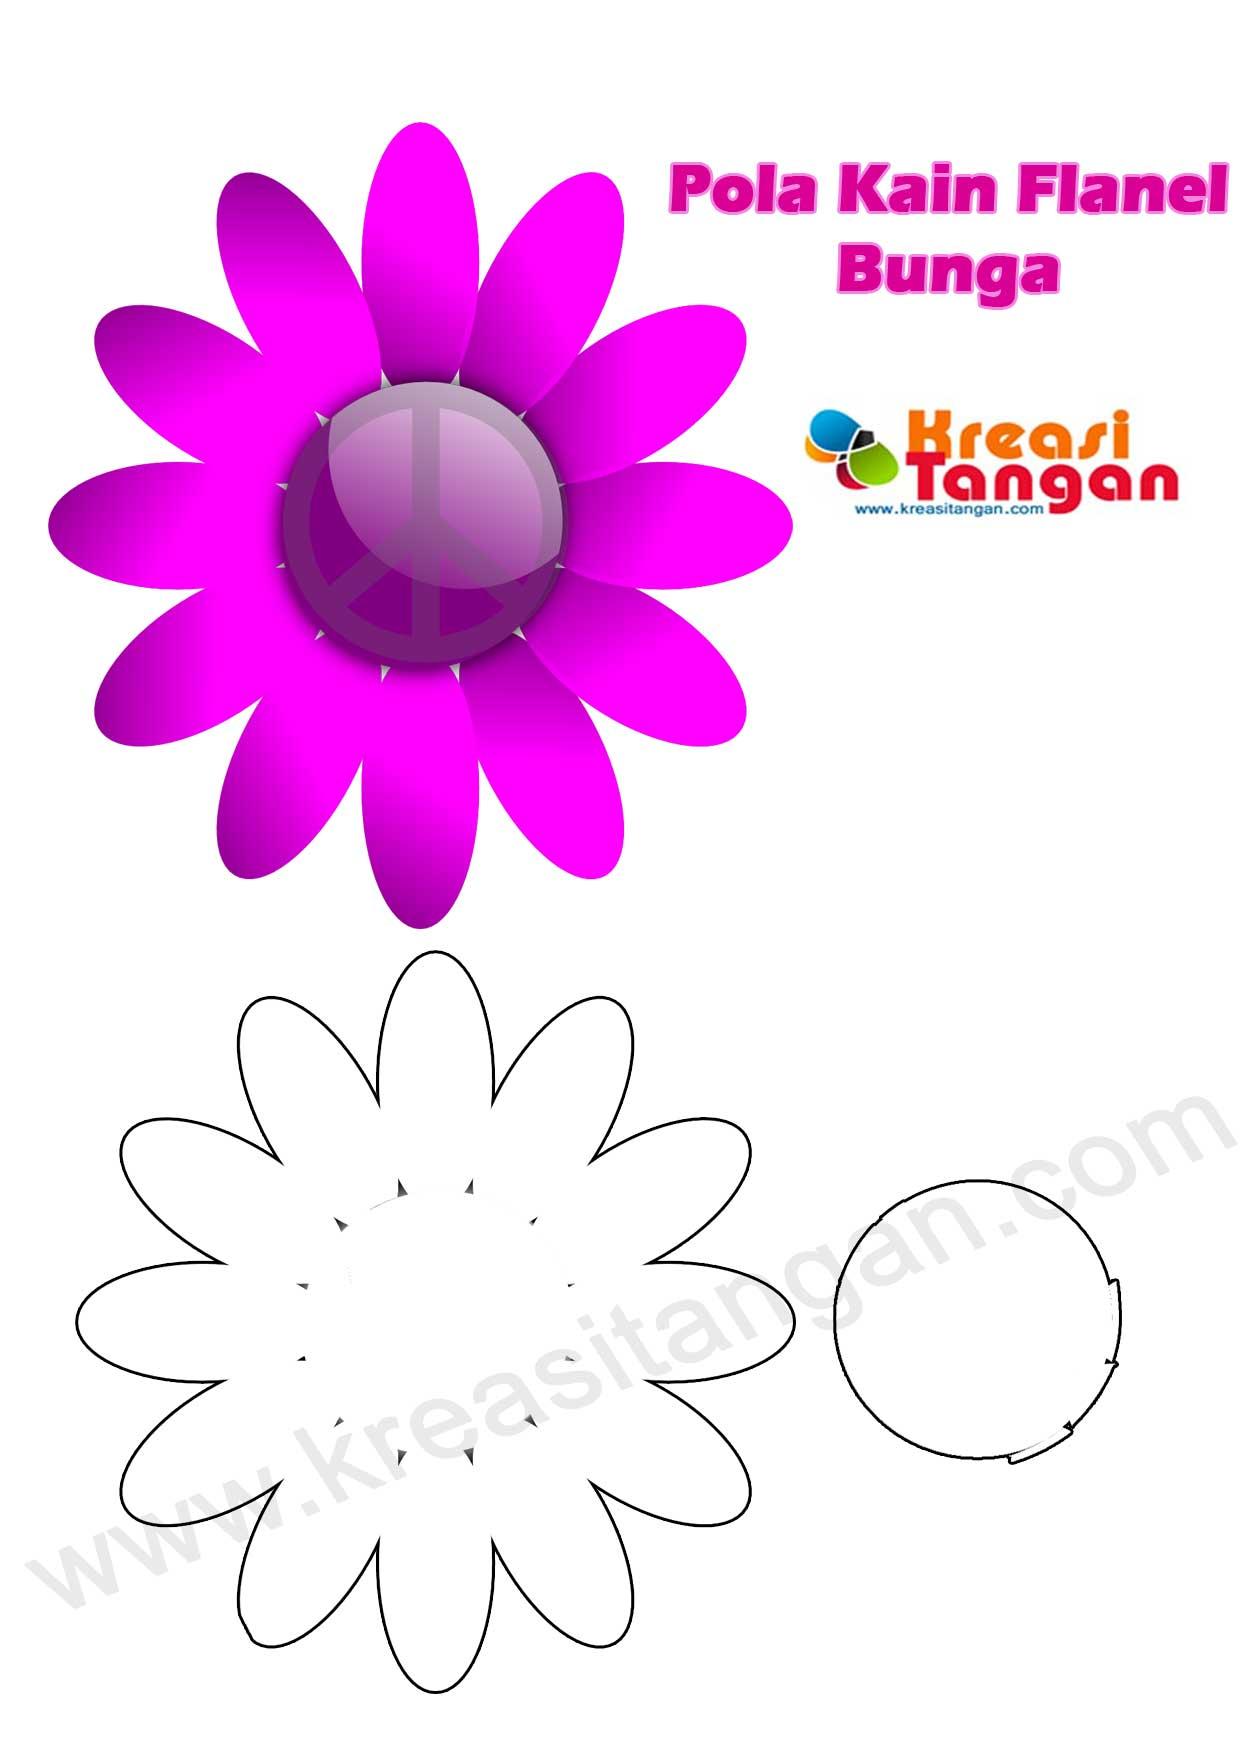 Pola Flanel  Bunga  My Favorite Handicraft